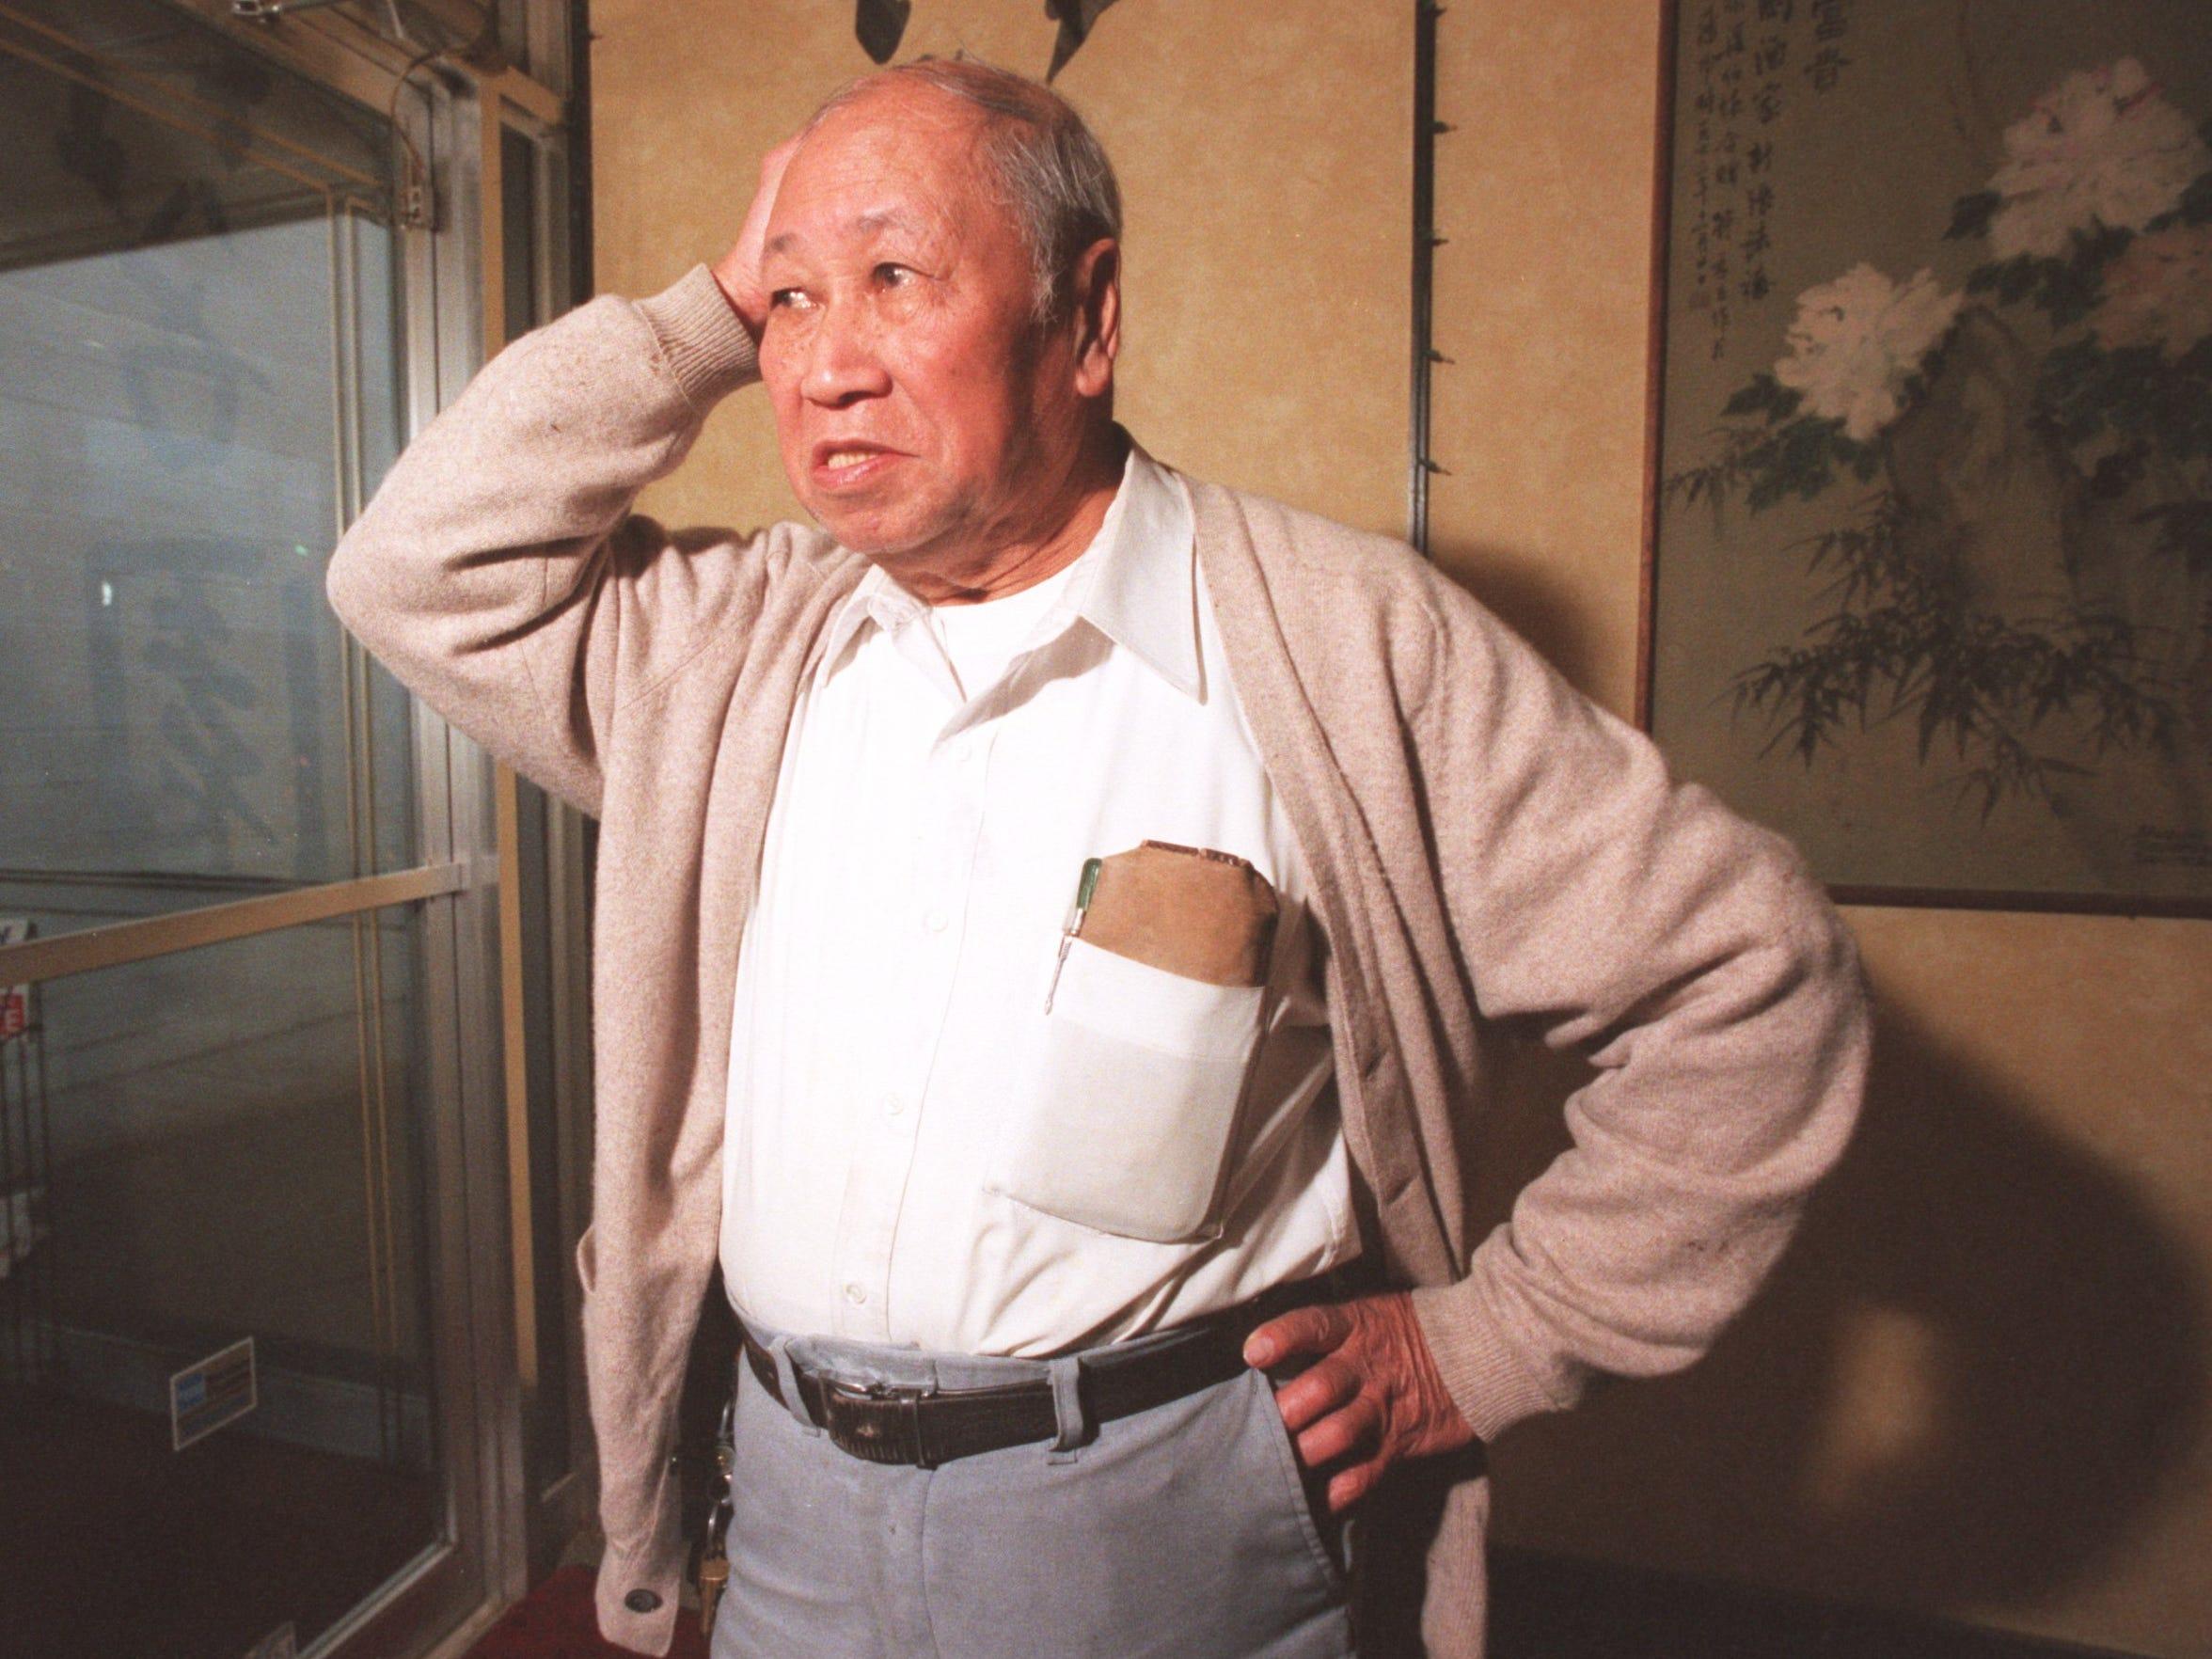 David Leong closed Leong's Tea House in December 1997.